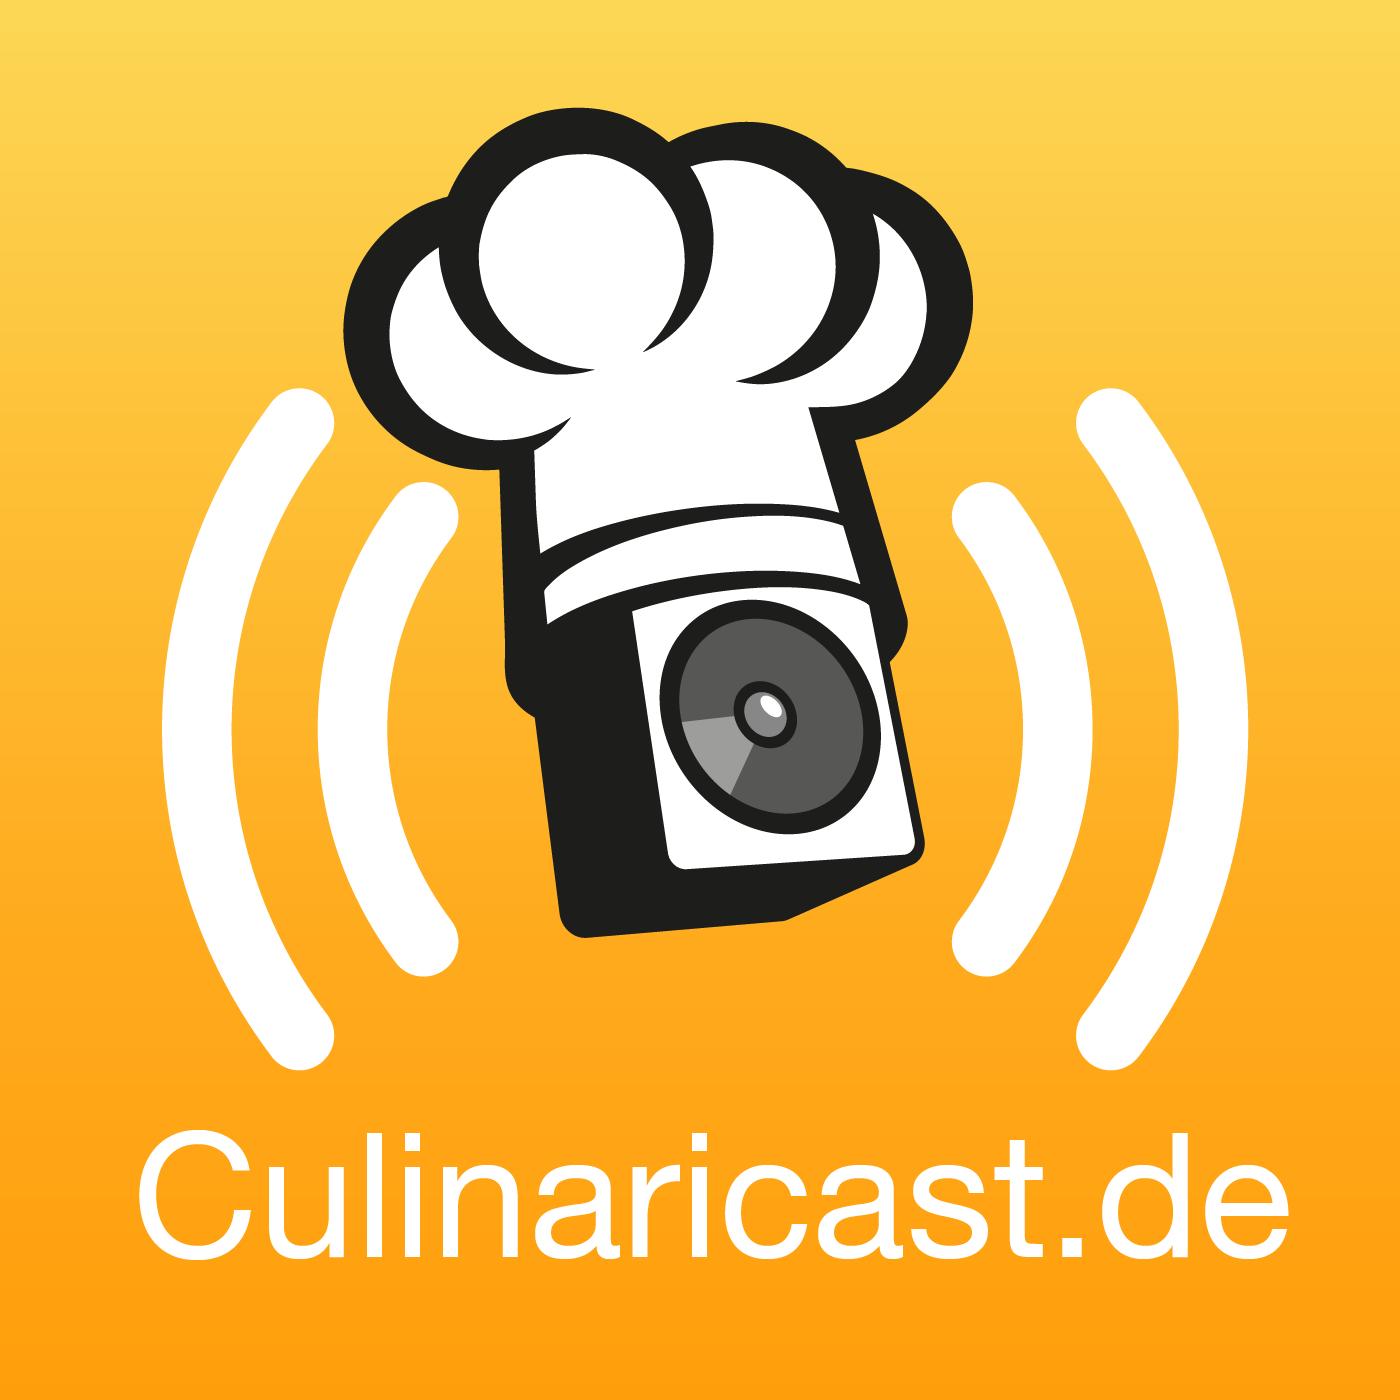 Culinaricast